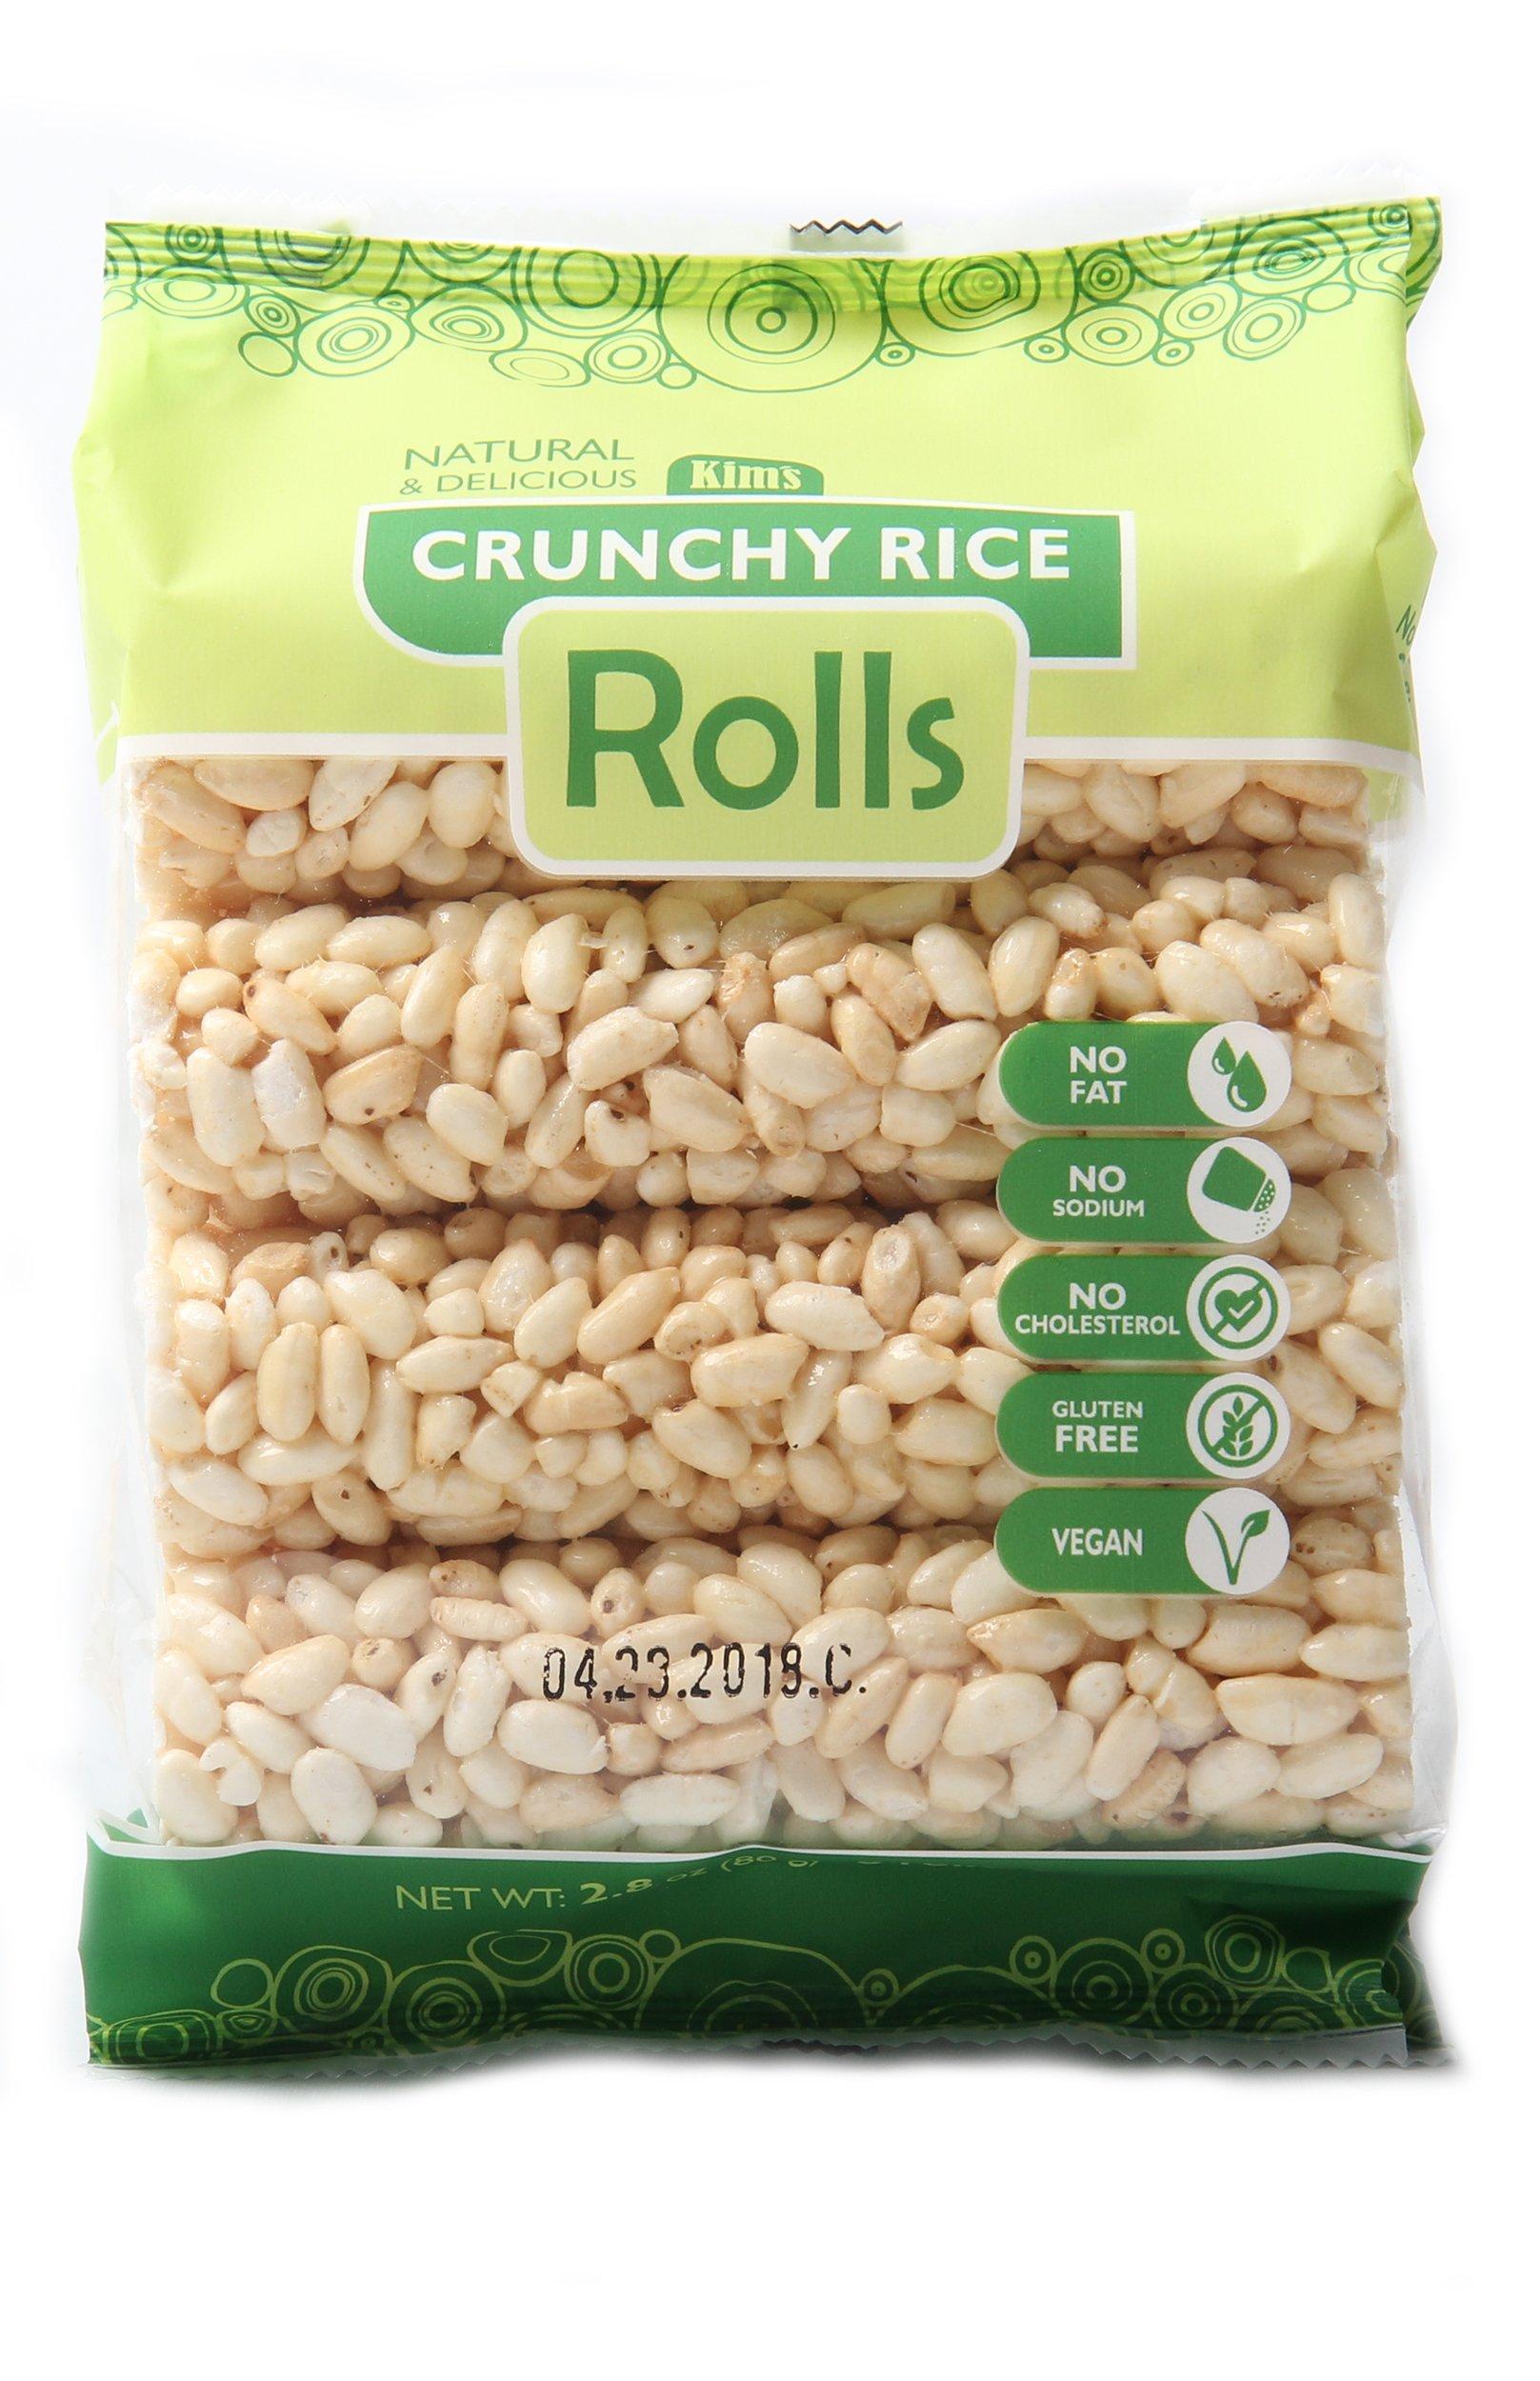 Kim's Crunchy Rice Rolls Gluten Free Vegan All Natural(20 Packs of 8 Rolls) by Kim's Crunchy Rolls